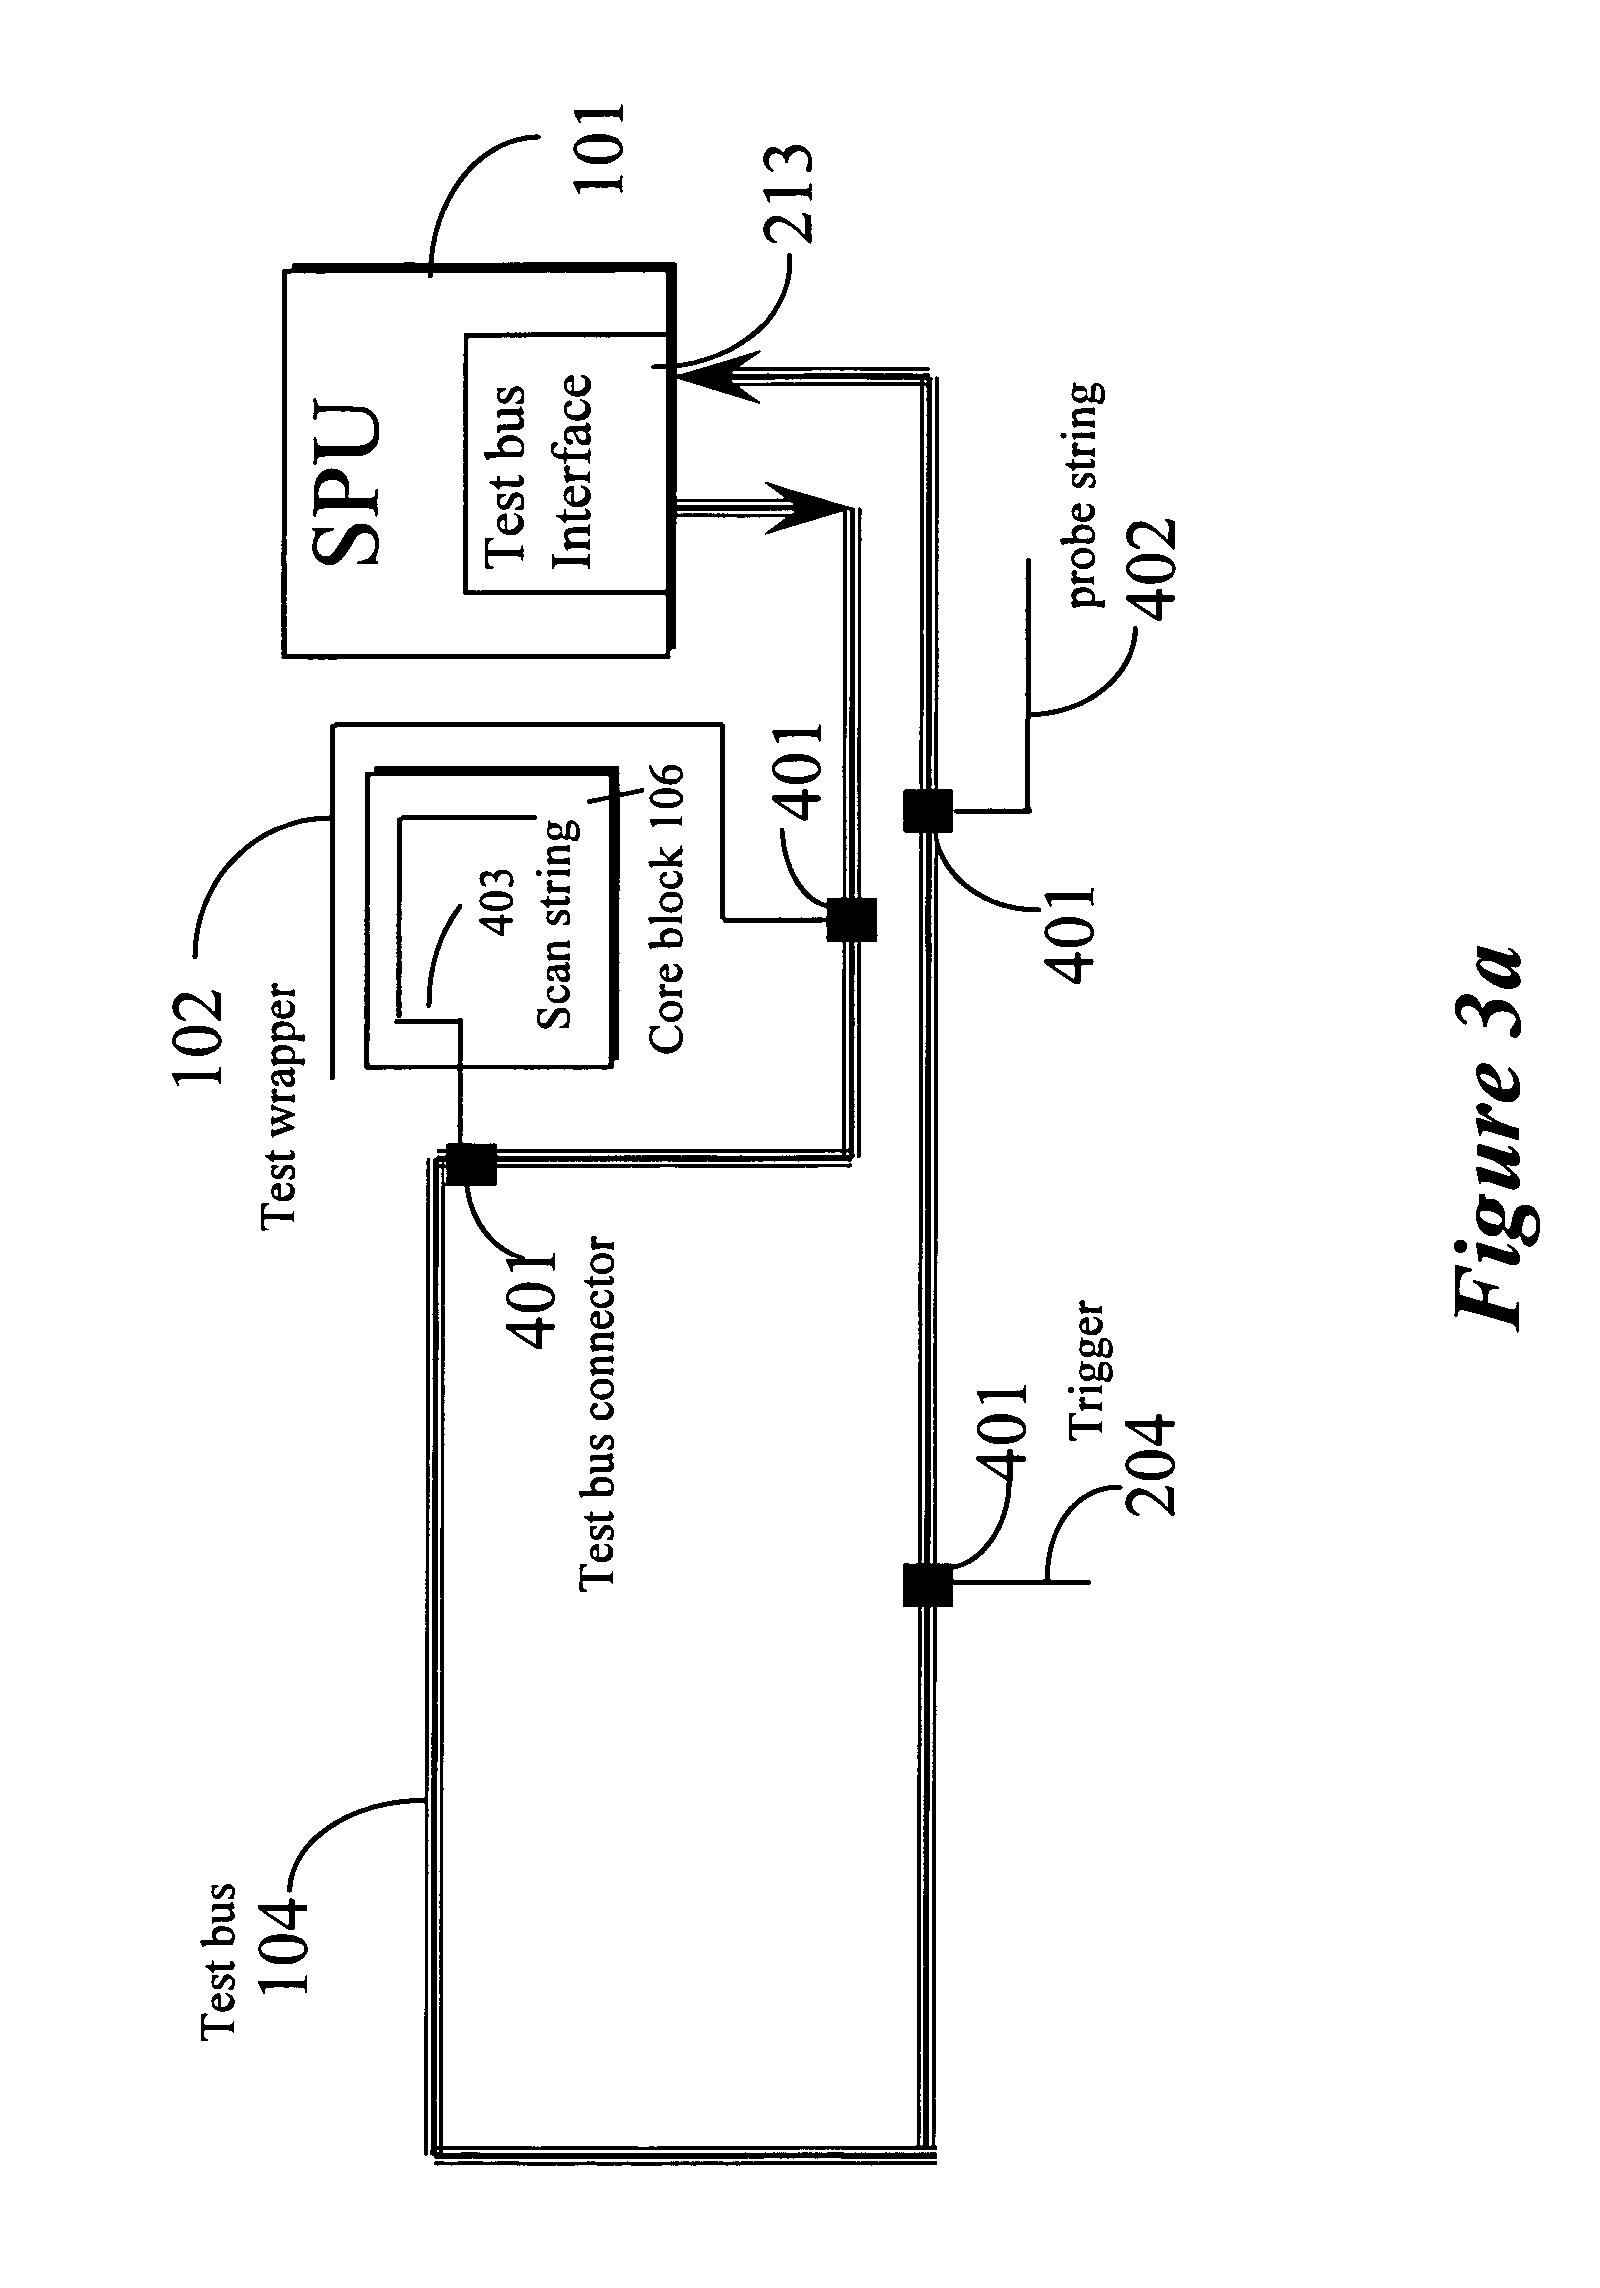 Patent Us 7836371 B2 Logic Probe Circuit Diagram